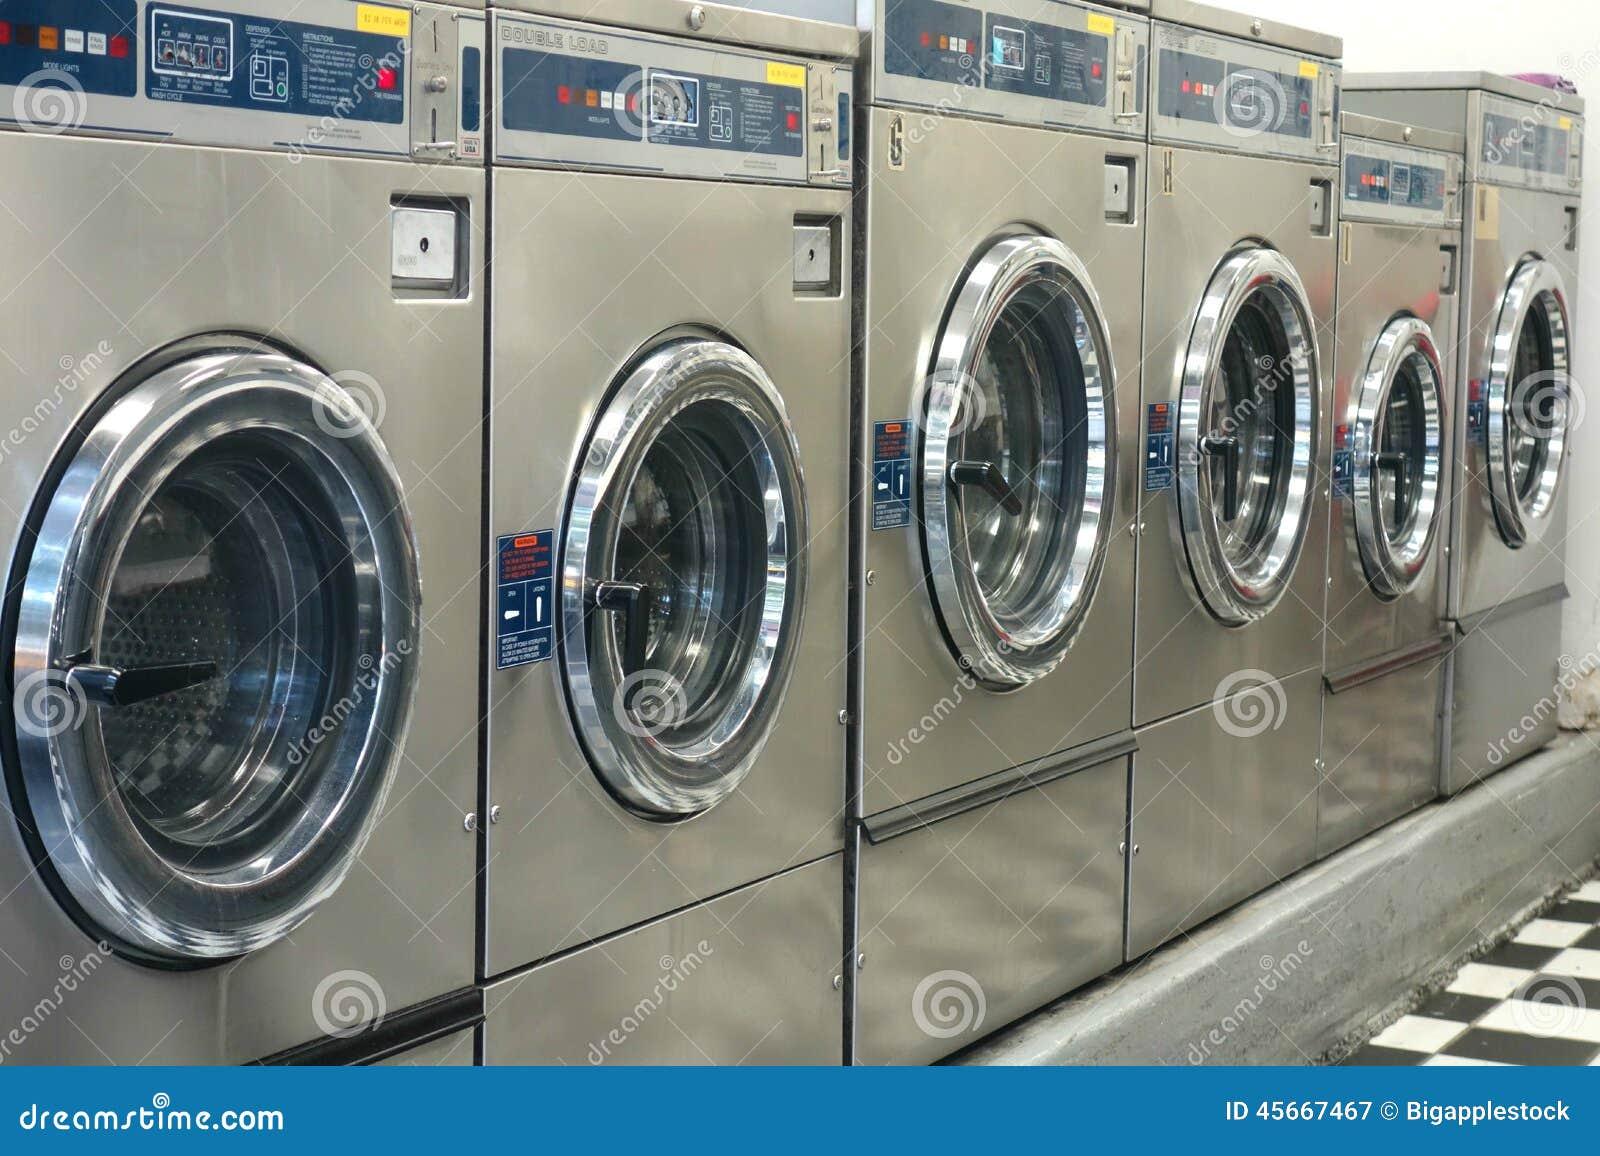 Commercial Washing Machines Stock Image - Image of machines